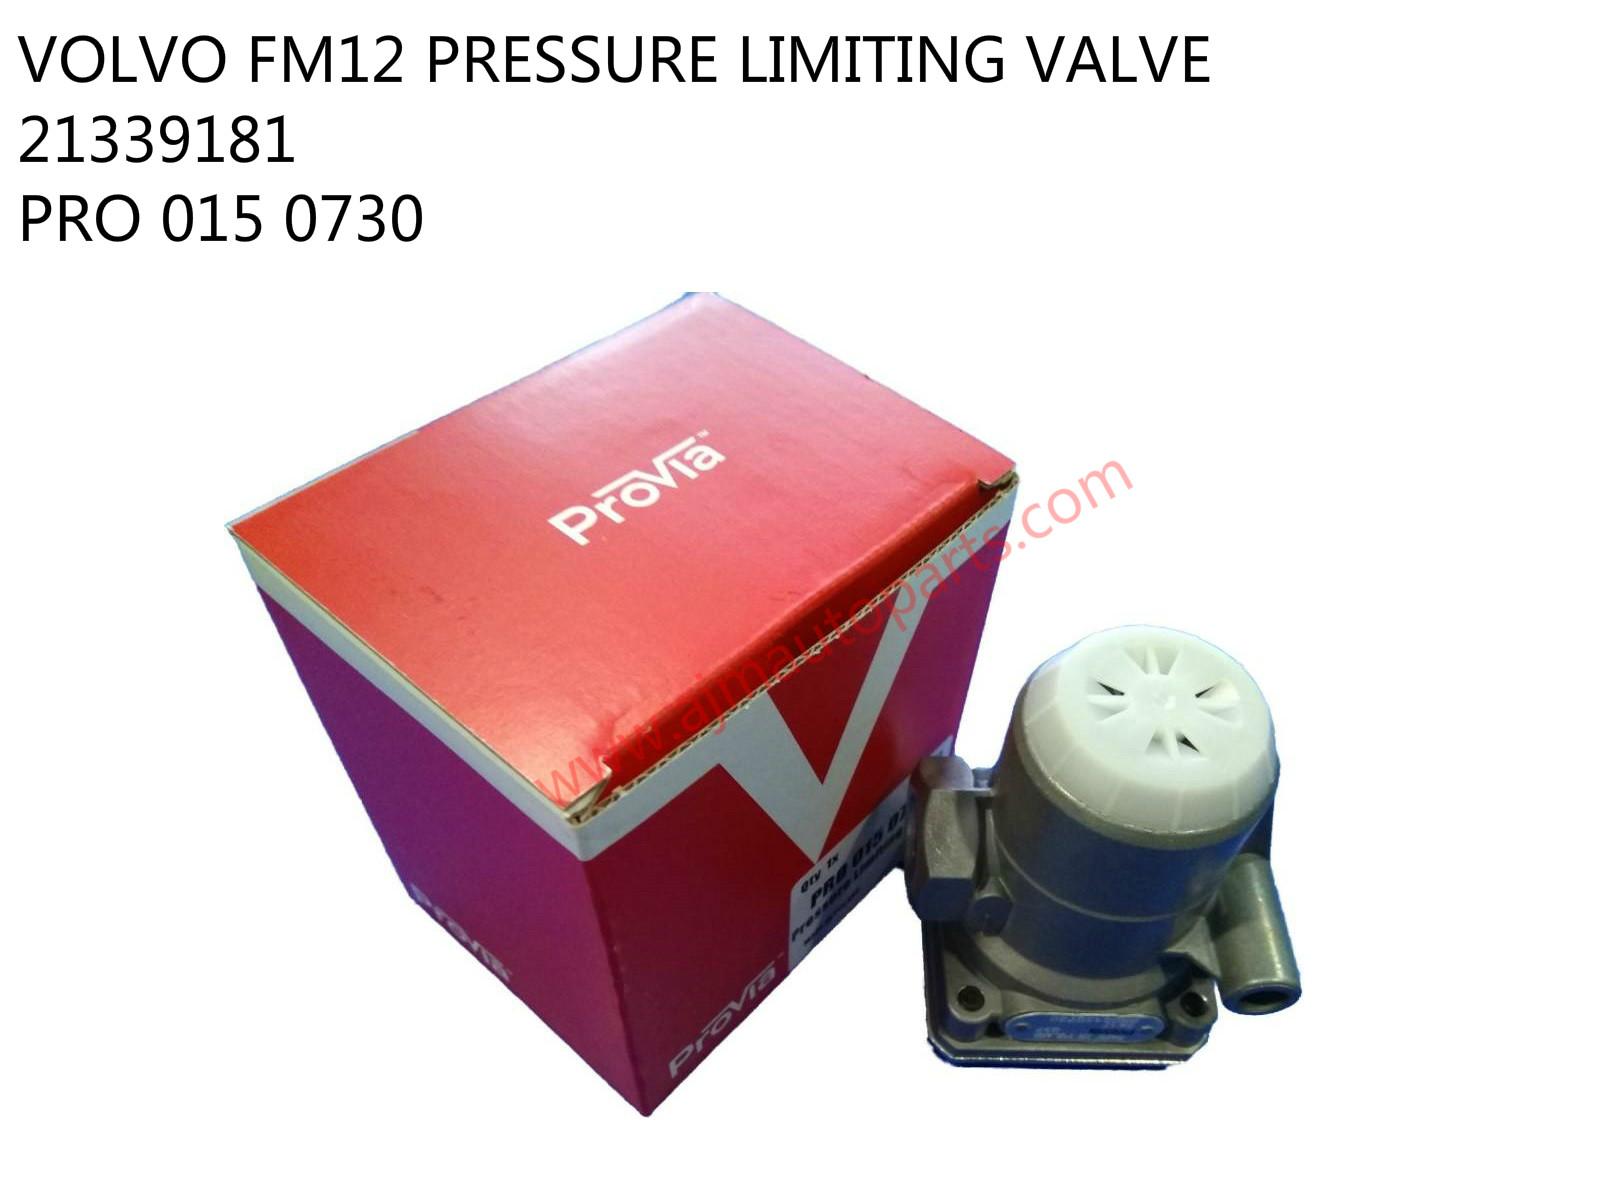 VOLVO FM PRESSURE LIMITING VALVE-PRO0150730-21339179